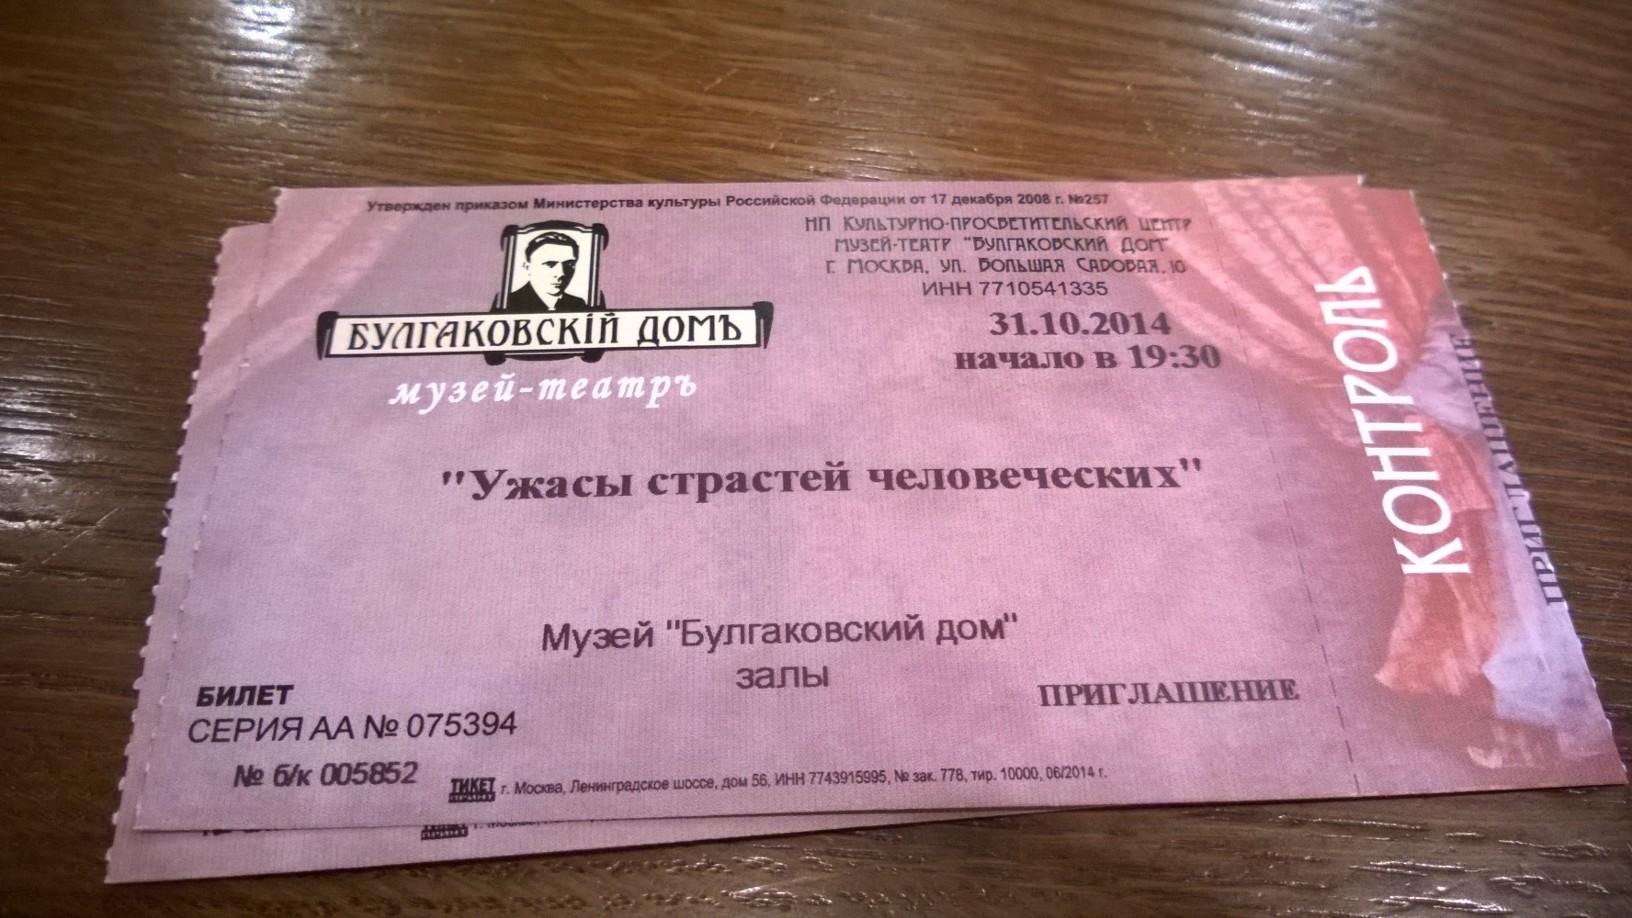 WP_20141031_003